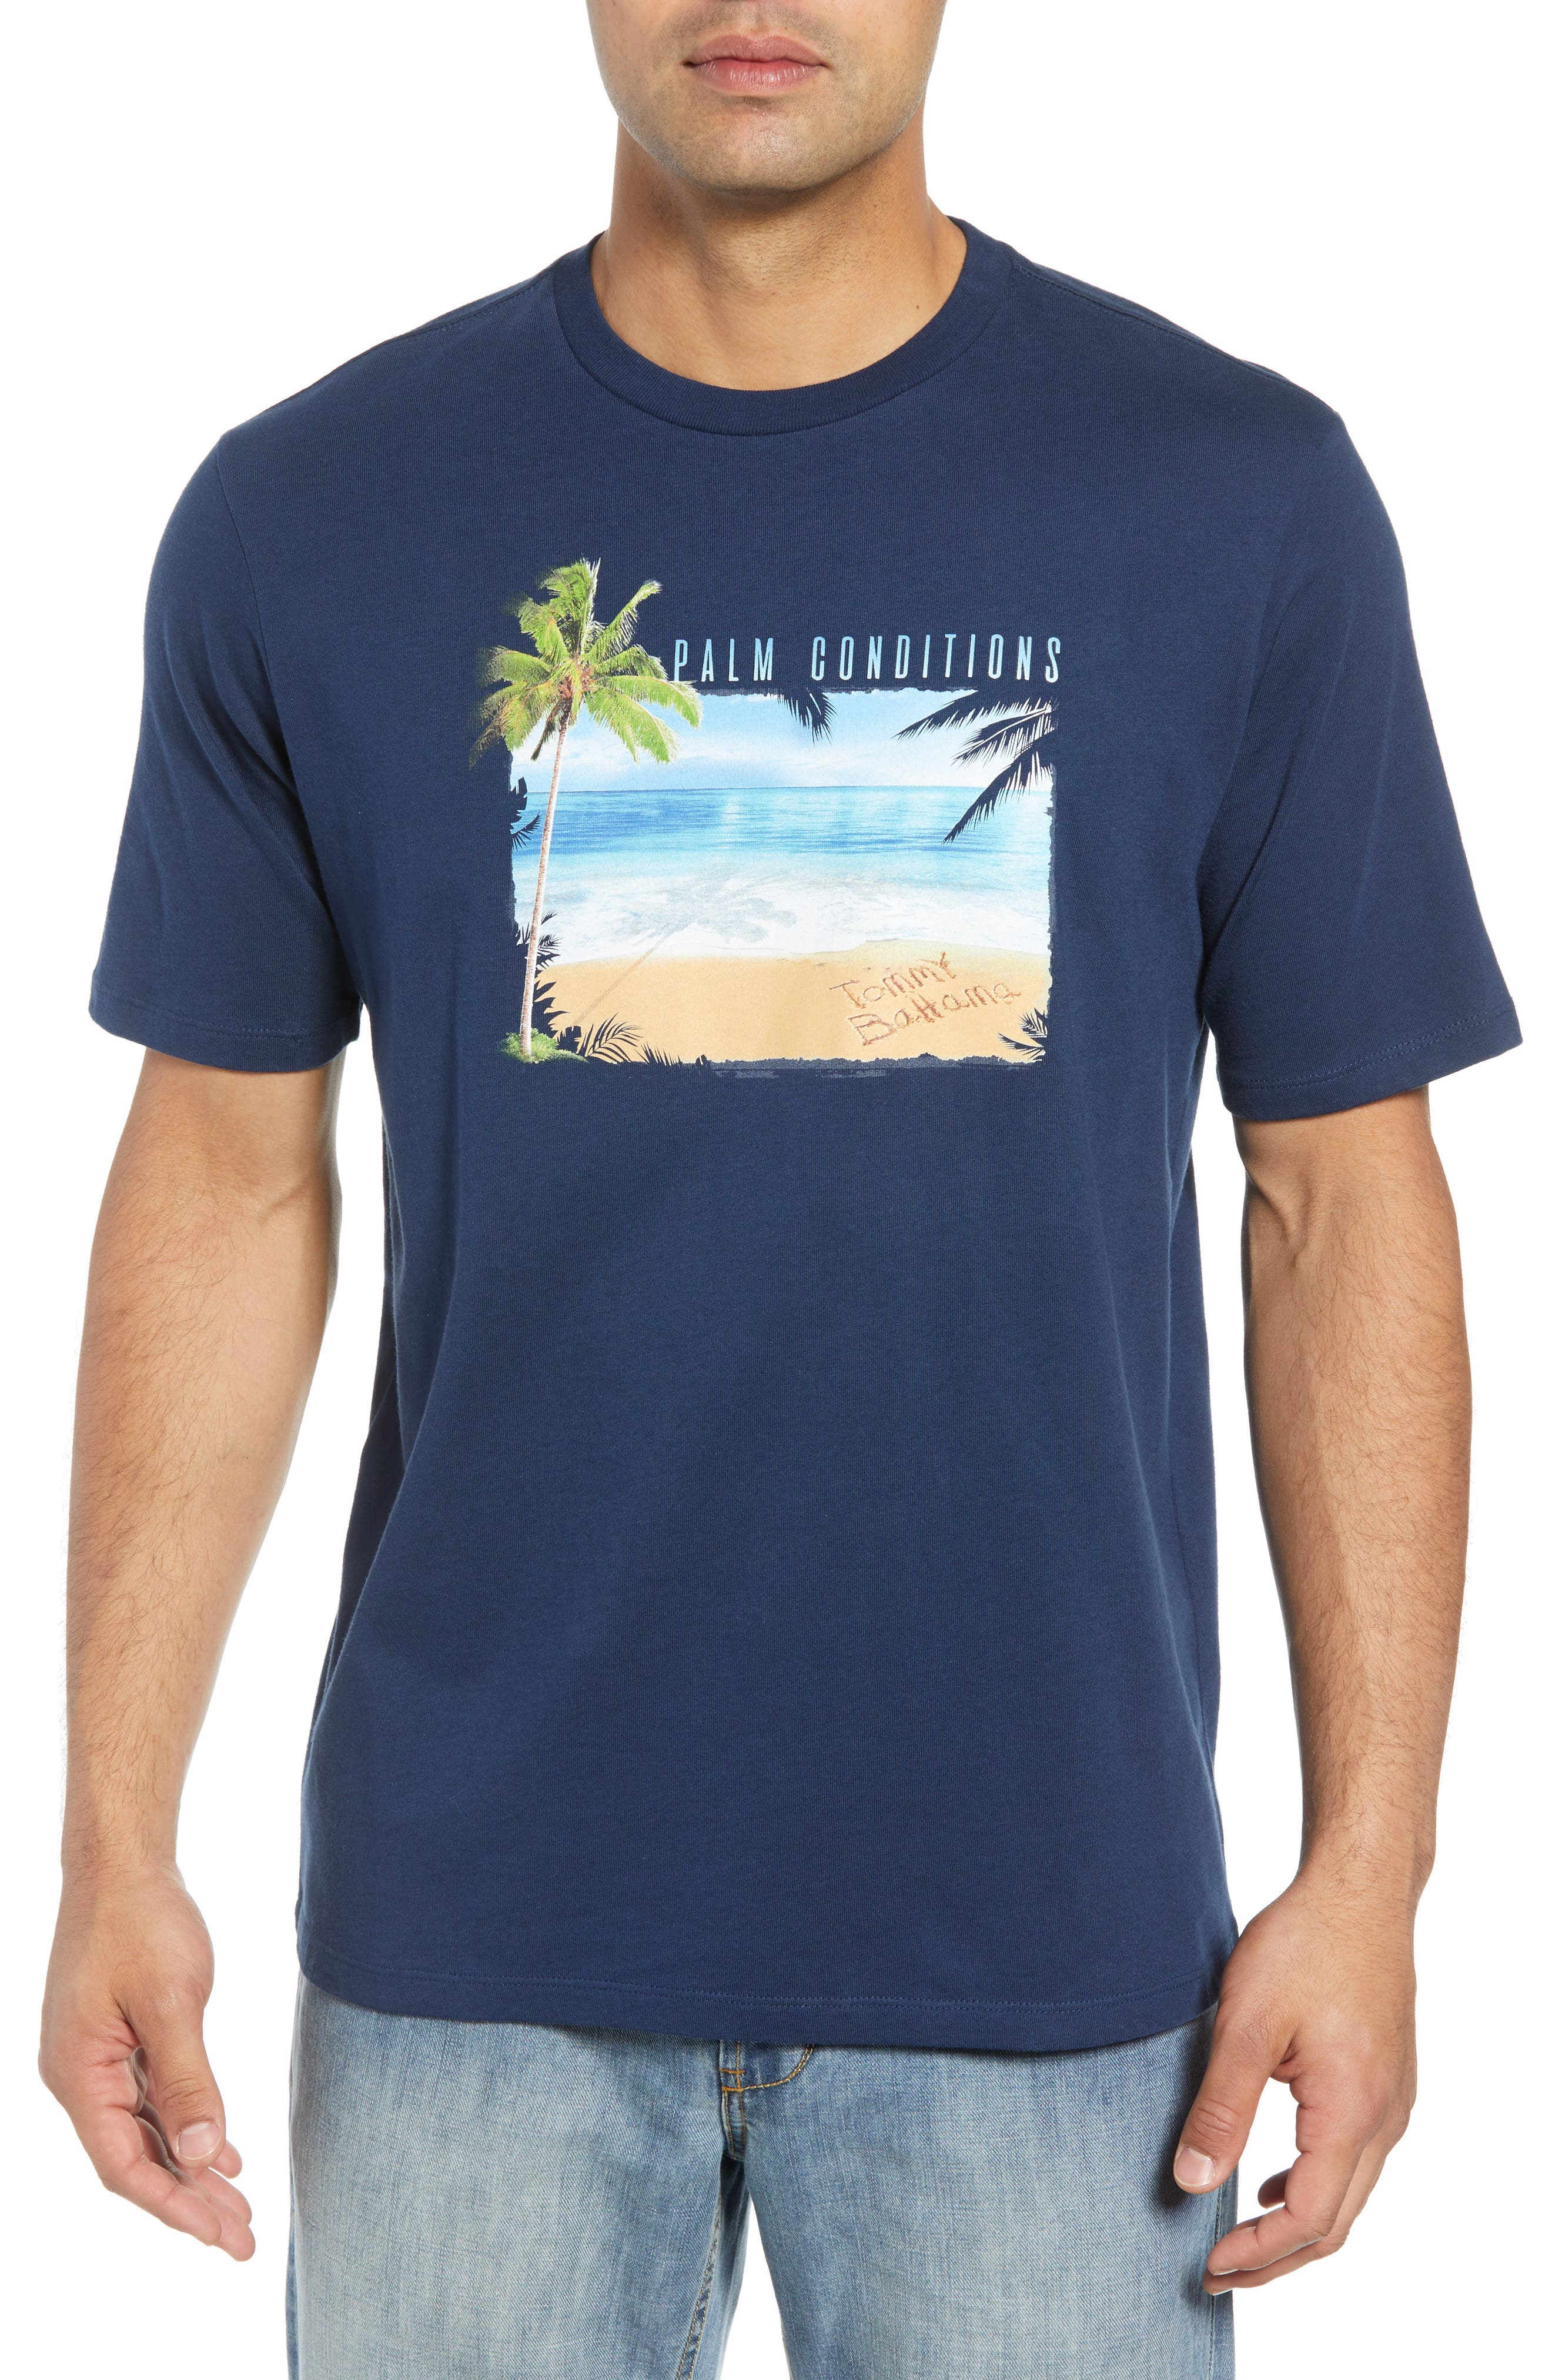 Palm Conditions T-Shirt,                             Main thumbnail 1, color,                             NAVY